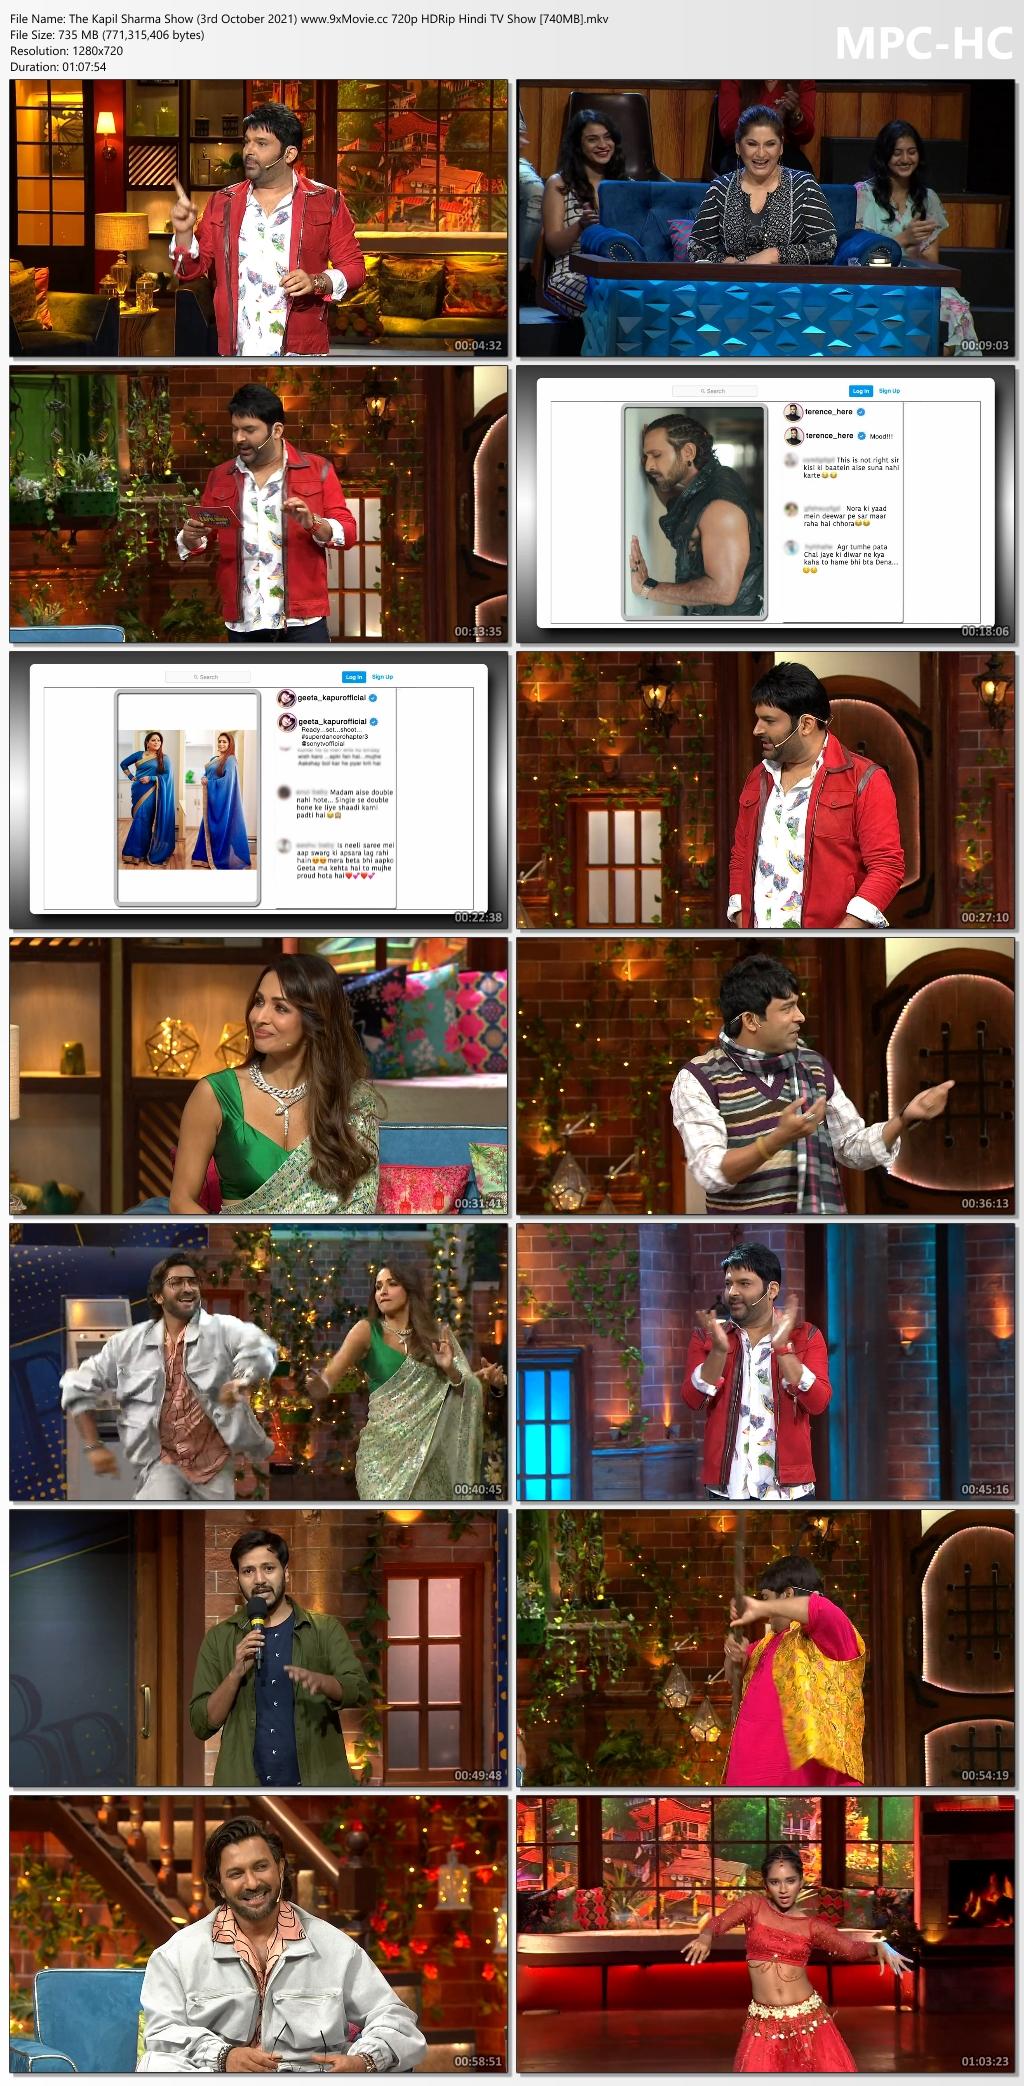 The-Kapil-Sharma-Show-3rd-October-2021-www-9x-Movie-cc-720p-HDRip-Hindi-TV-Show-740-MB-mkv